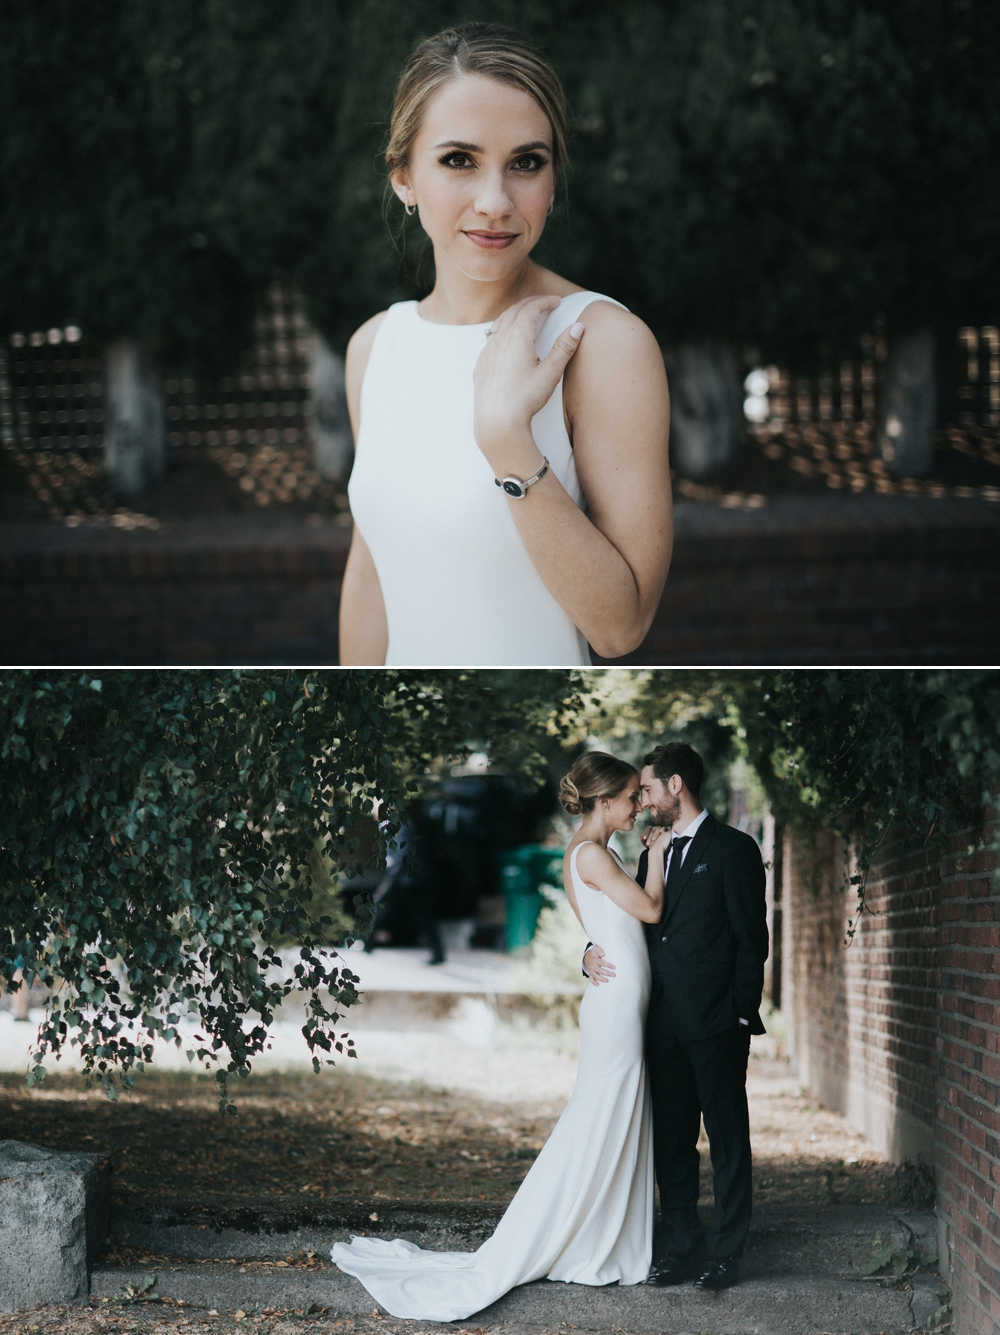 bride-with-hand-on-shoulder